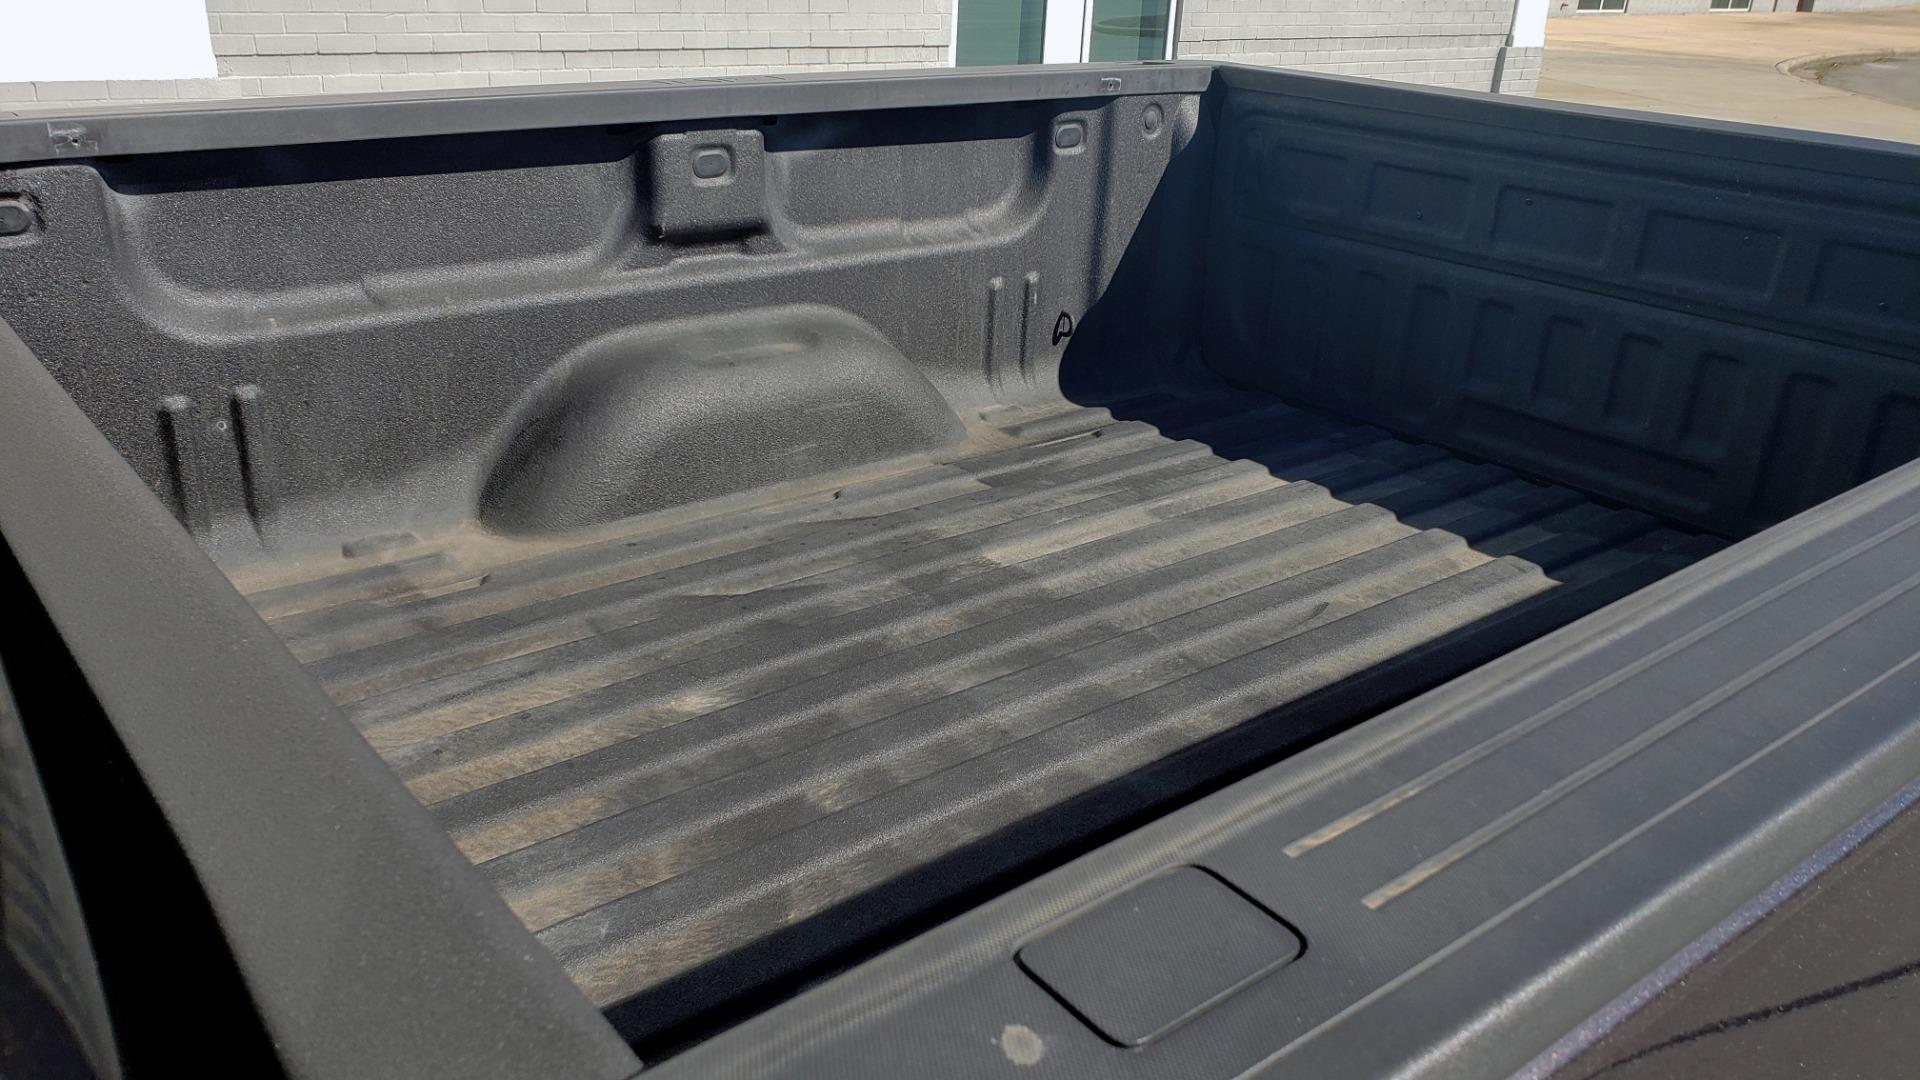 Used 2015 GMC SIERRA 2500HD DENALI 4WD CREWCAB / 6.6L DURAMAX / 6-SPD AUTO / NAV / BOSE for sale $50,995 at Formula Imports in Charlotte NC 28227 11